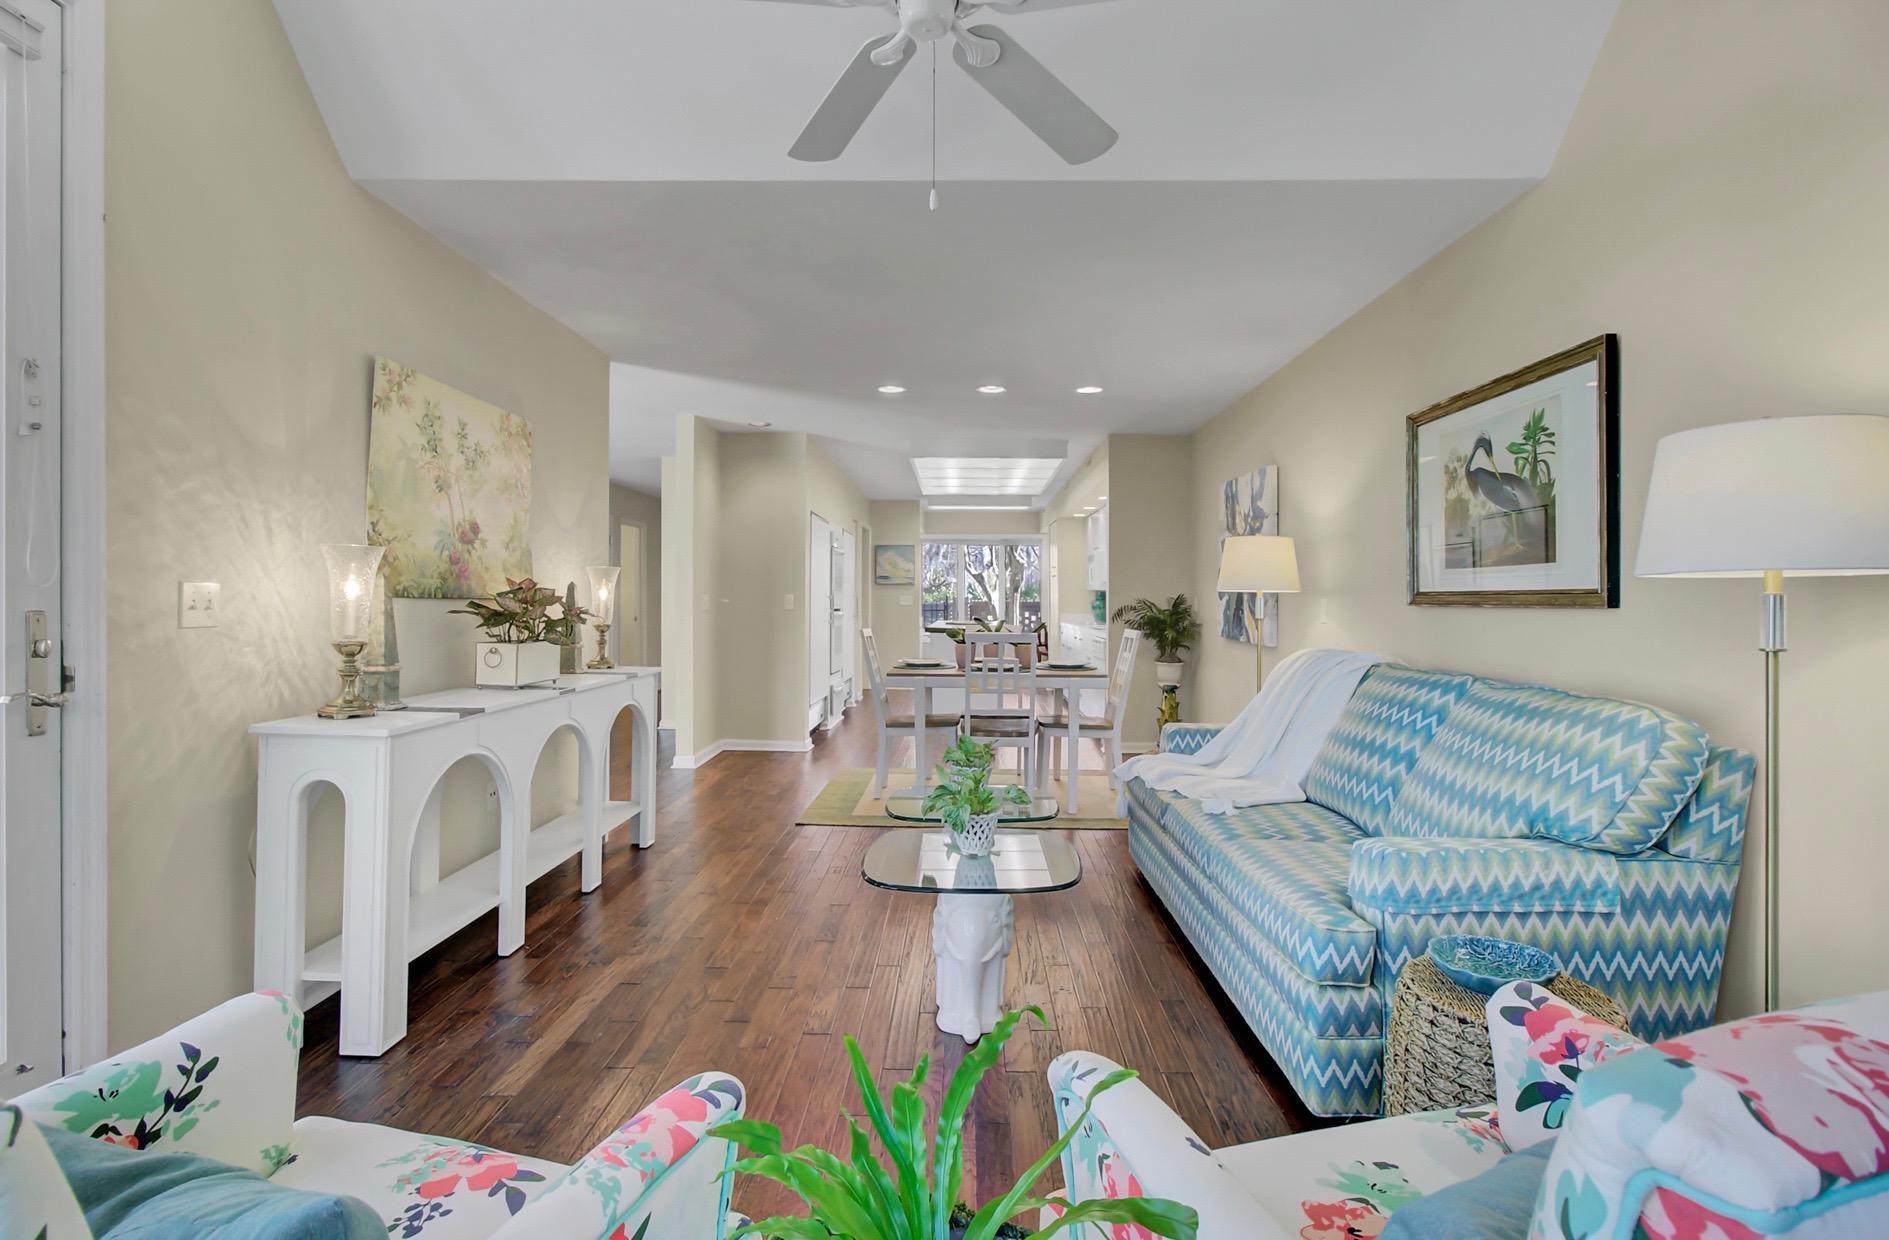 Wappoo Creek Place Homes For Sale - 29 Wappoo Creek, Charleston, SC - 17